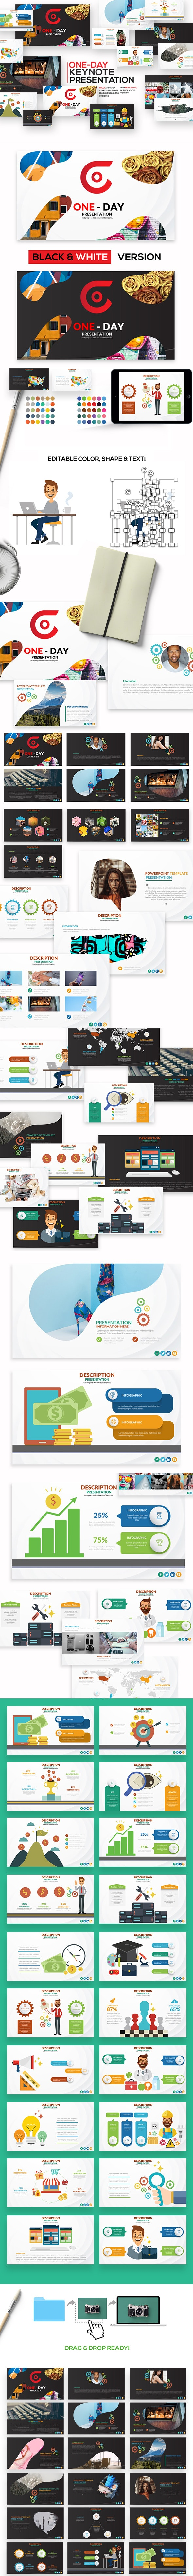 One-Day Keynote Presentation - Keynote Templates Presentation Templates